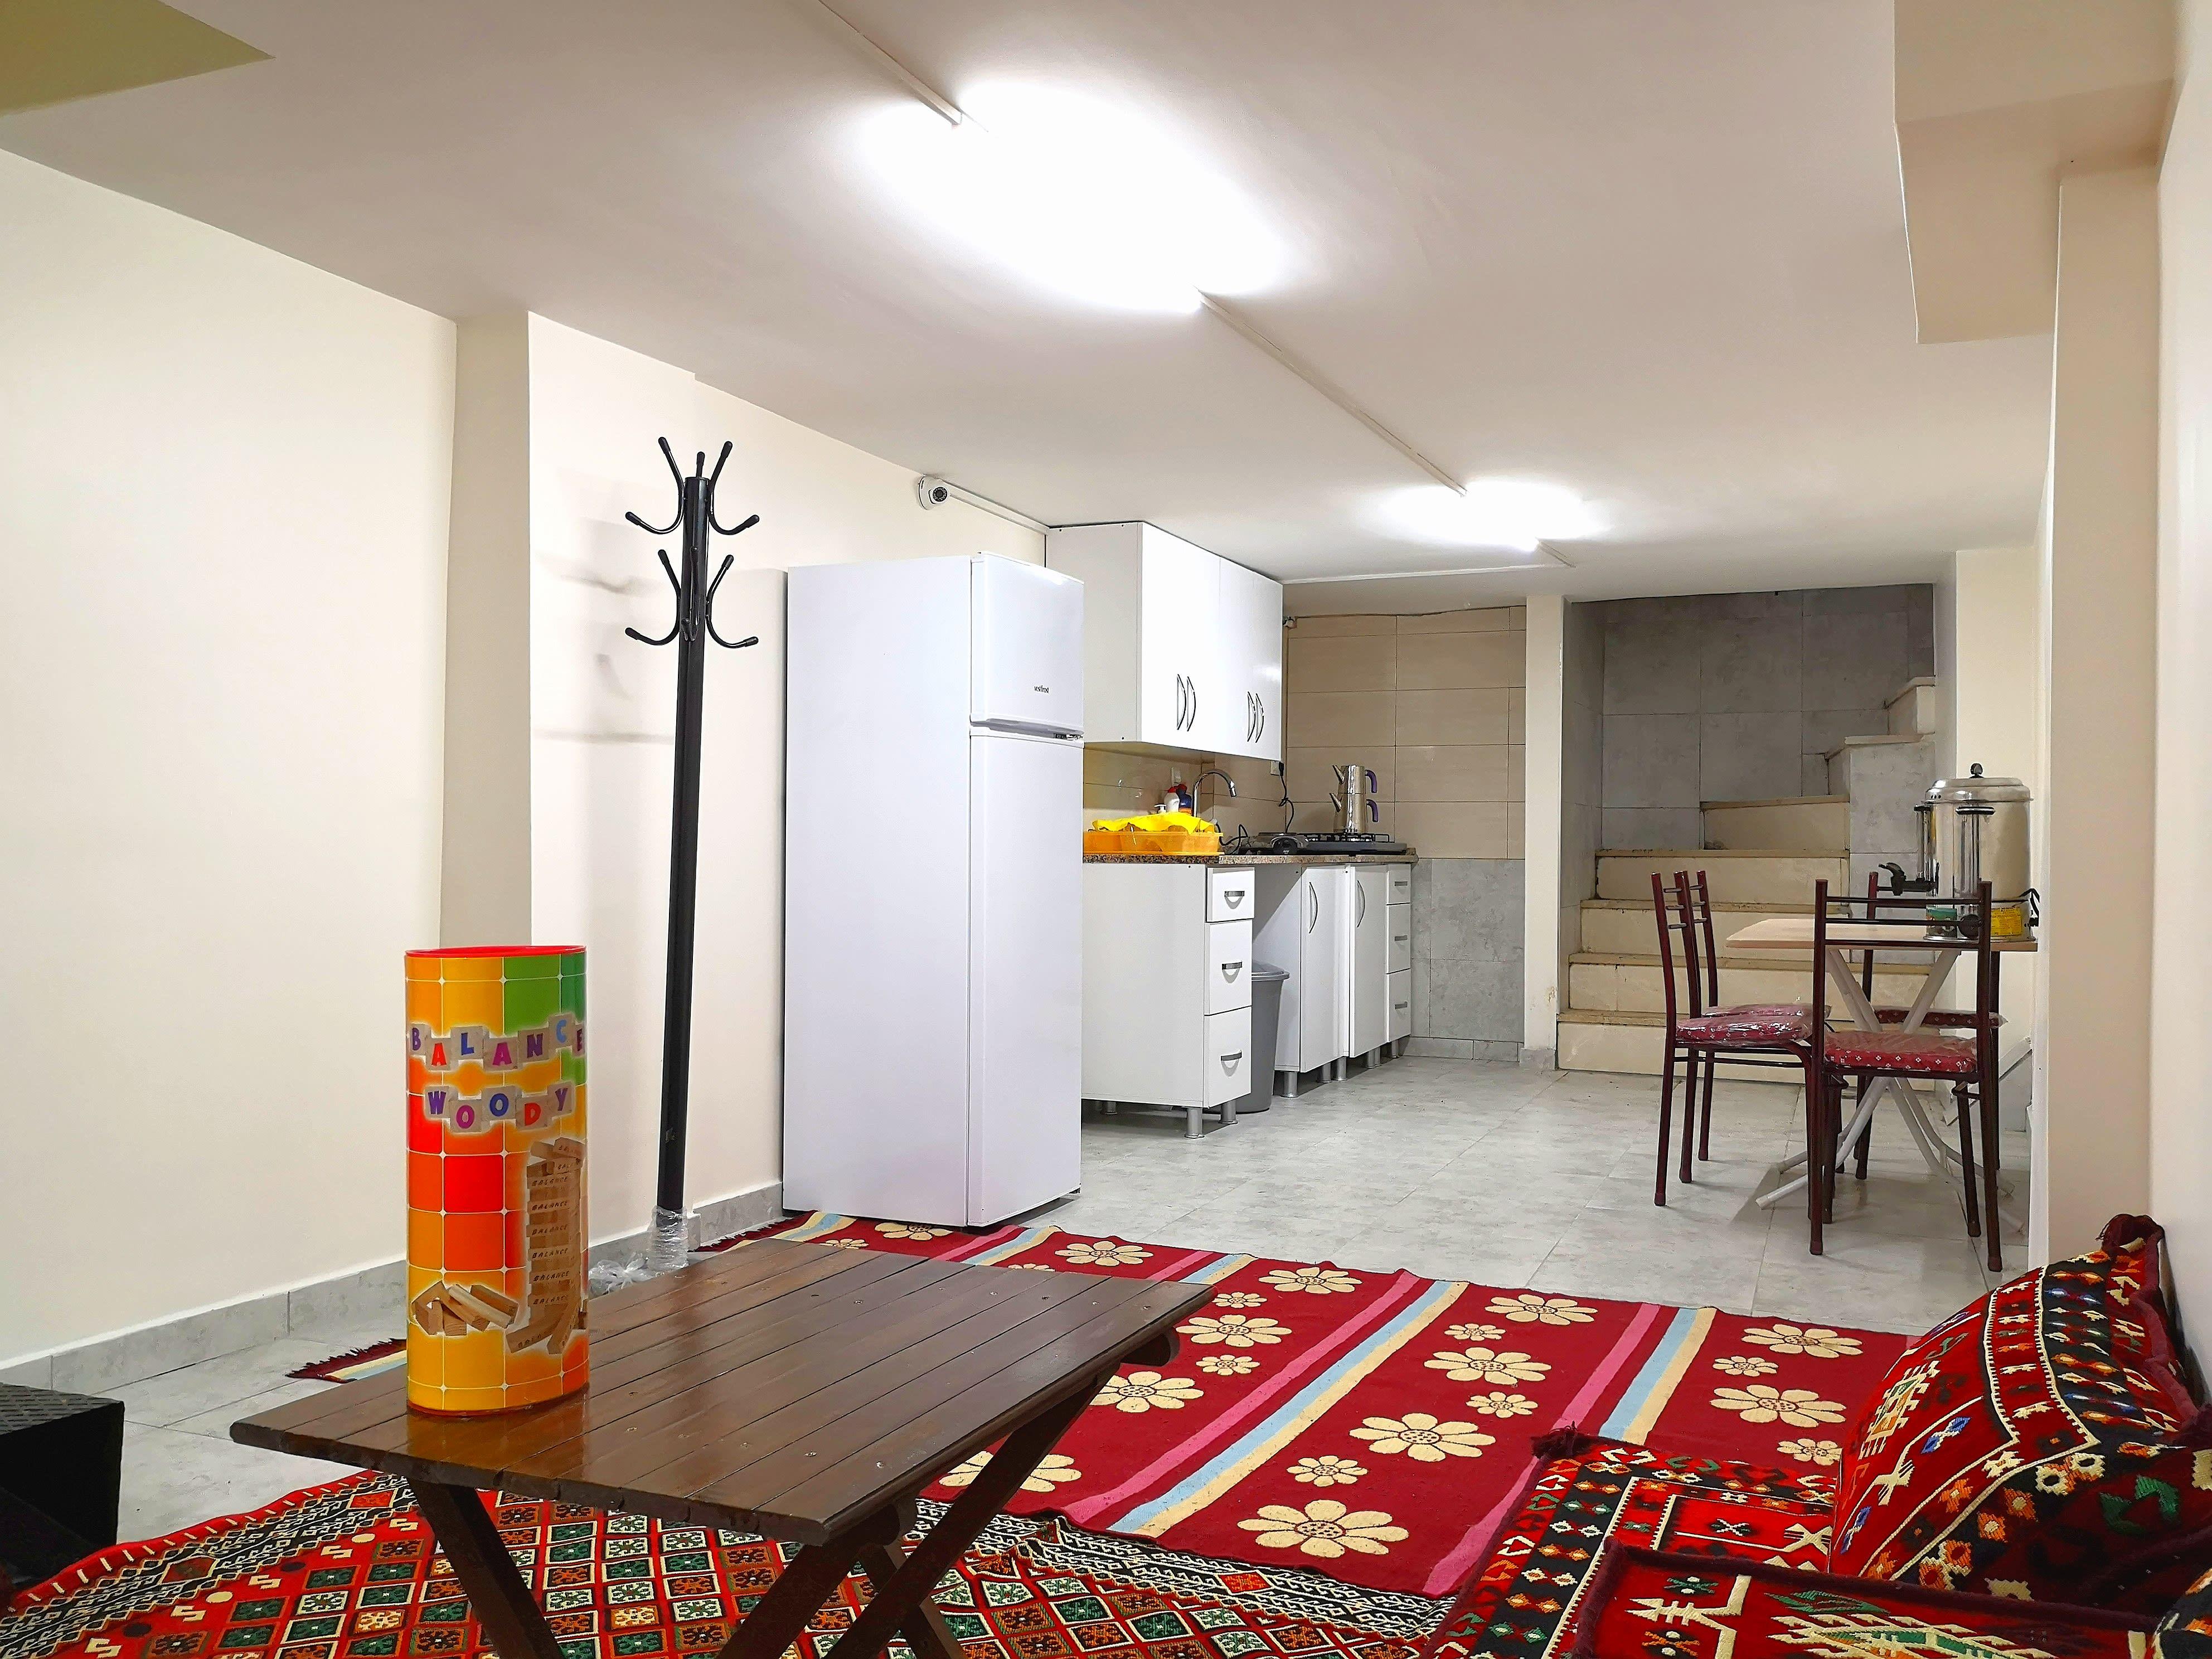 HOSTEL - West Istanbul Hostel